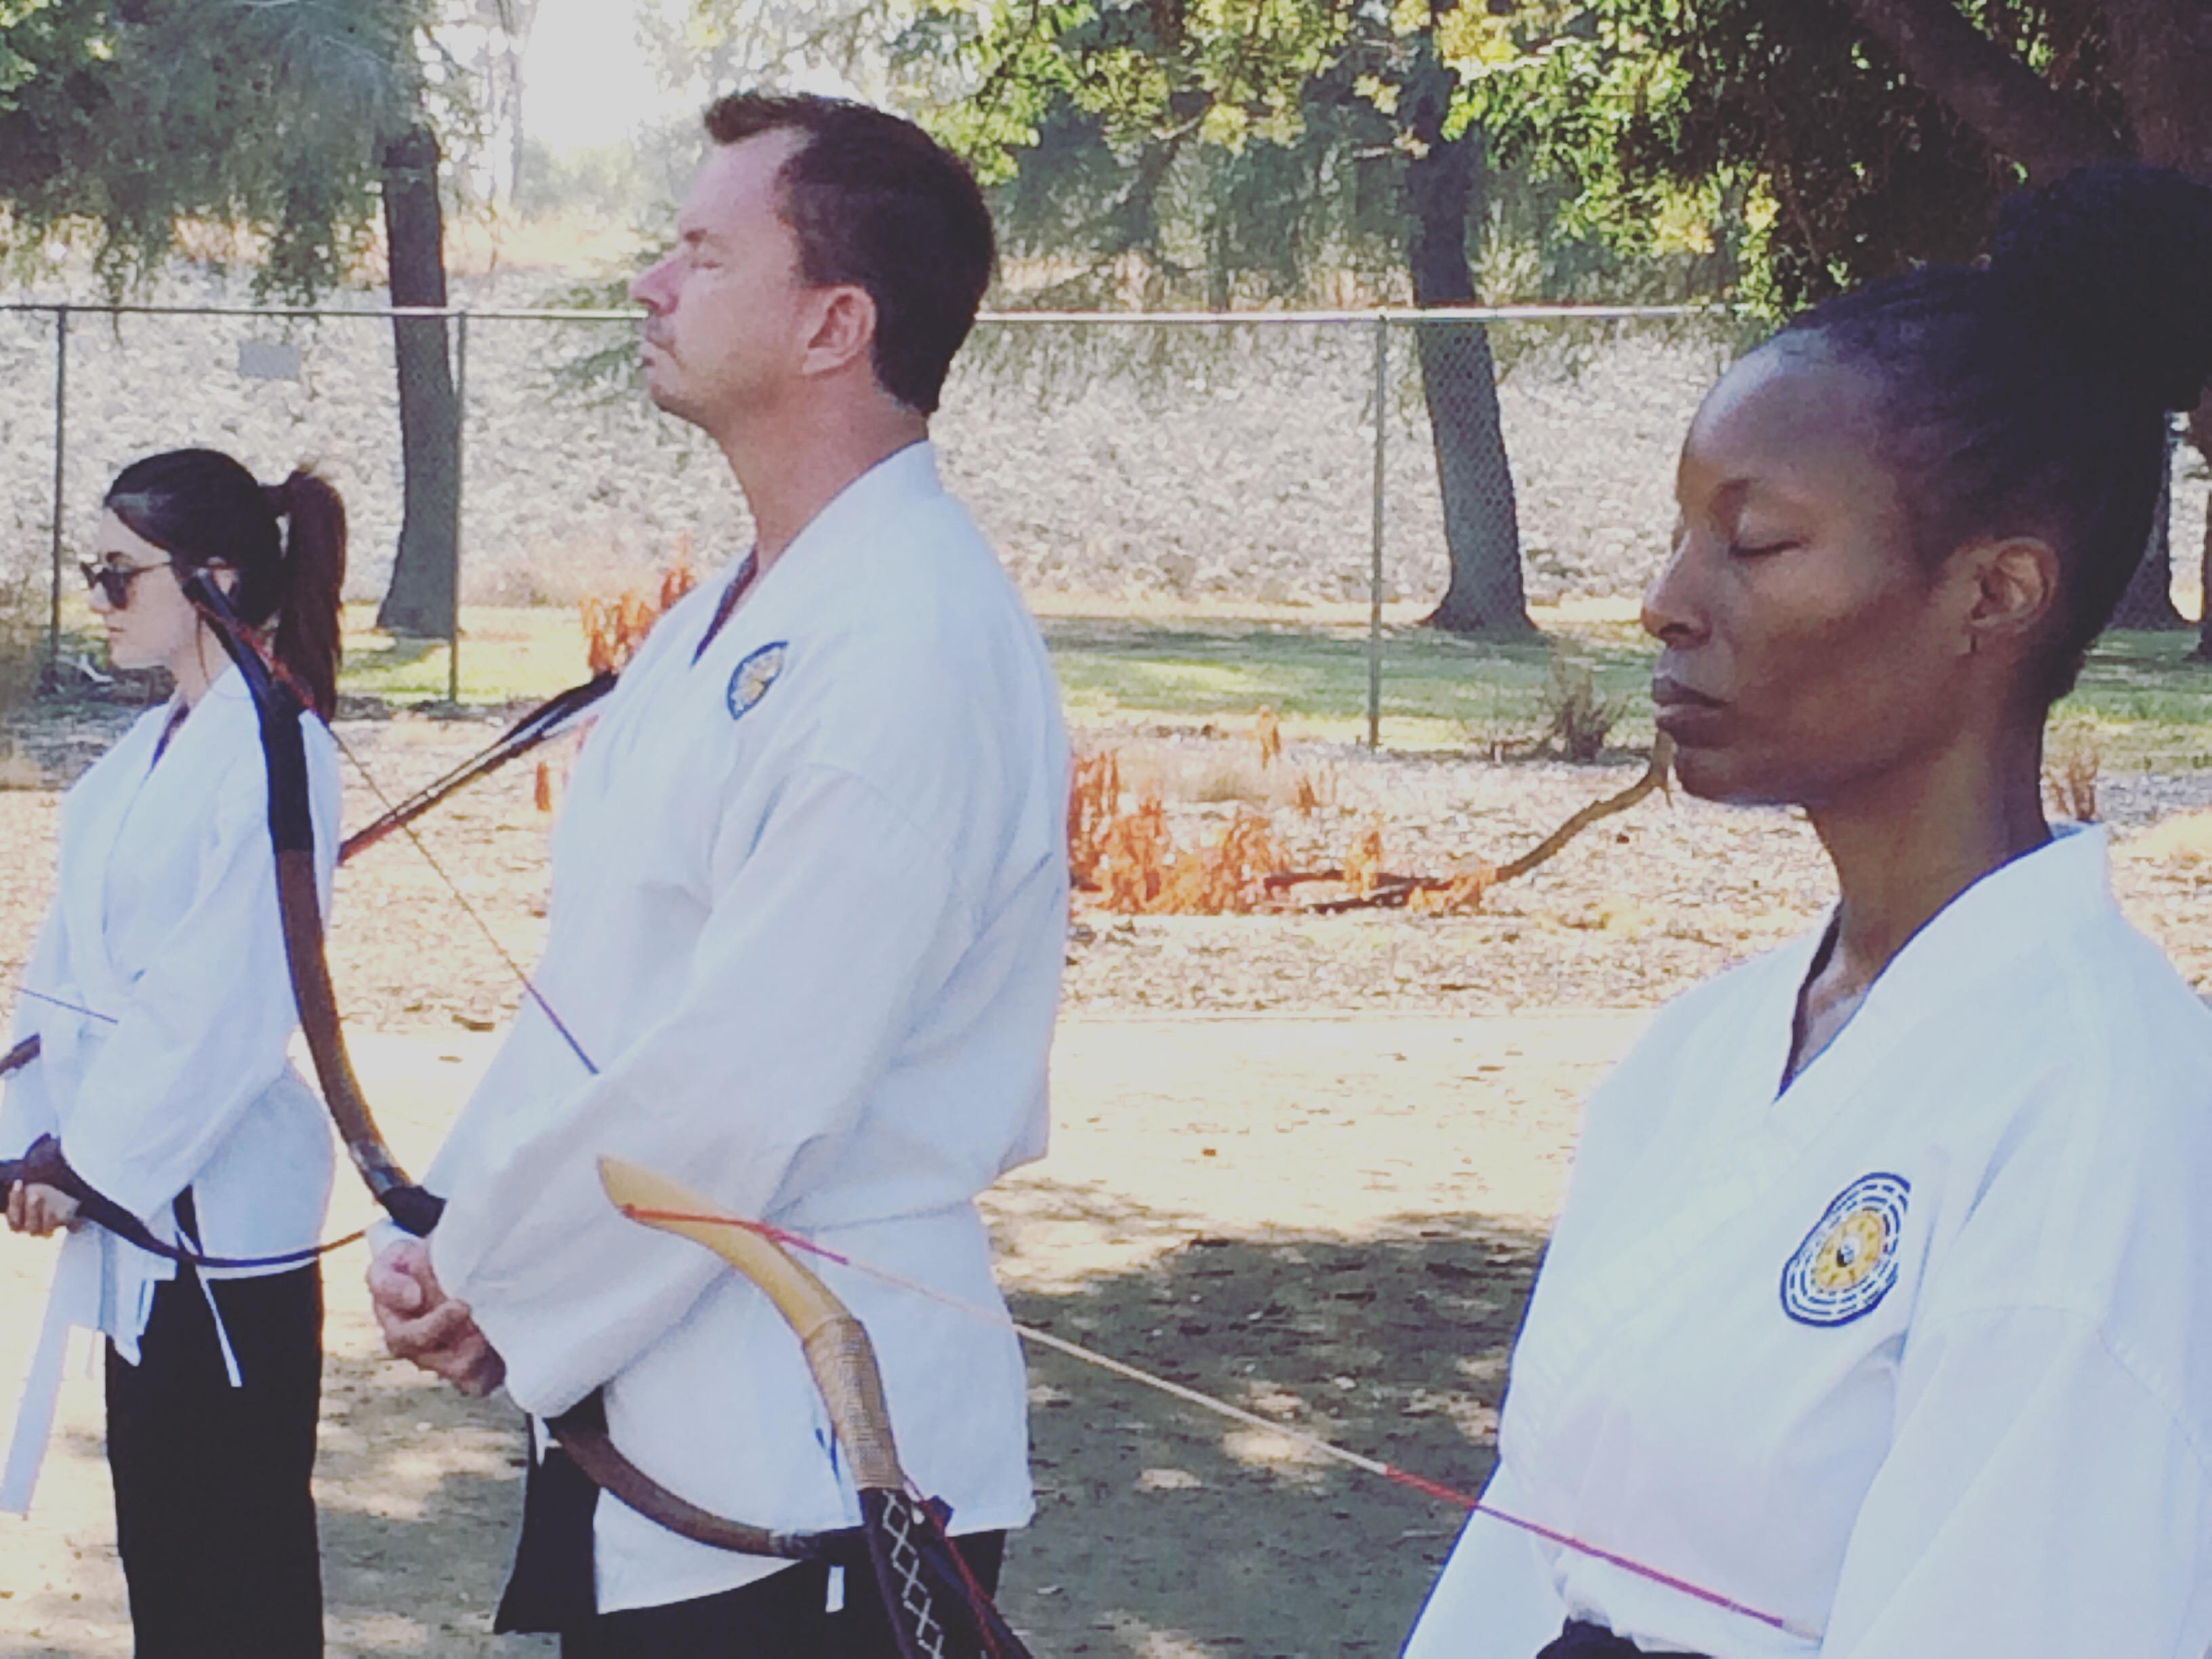 Art of Chinese Archery According to Master Ben Martin